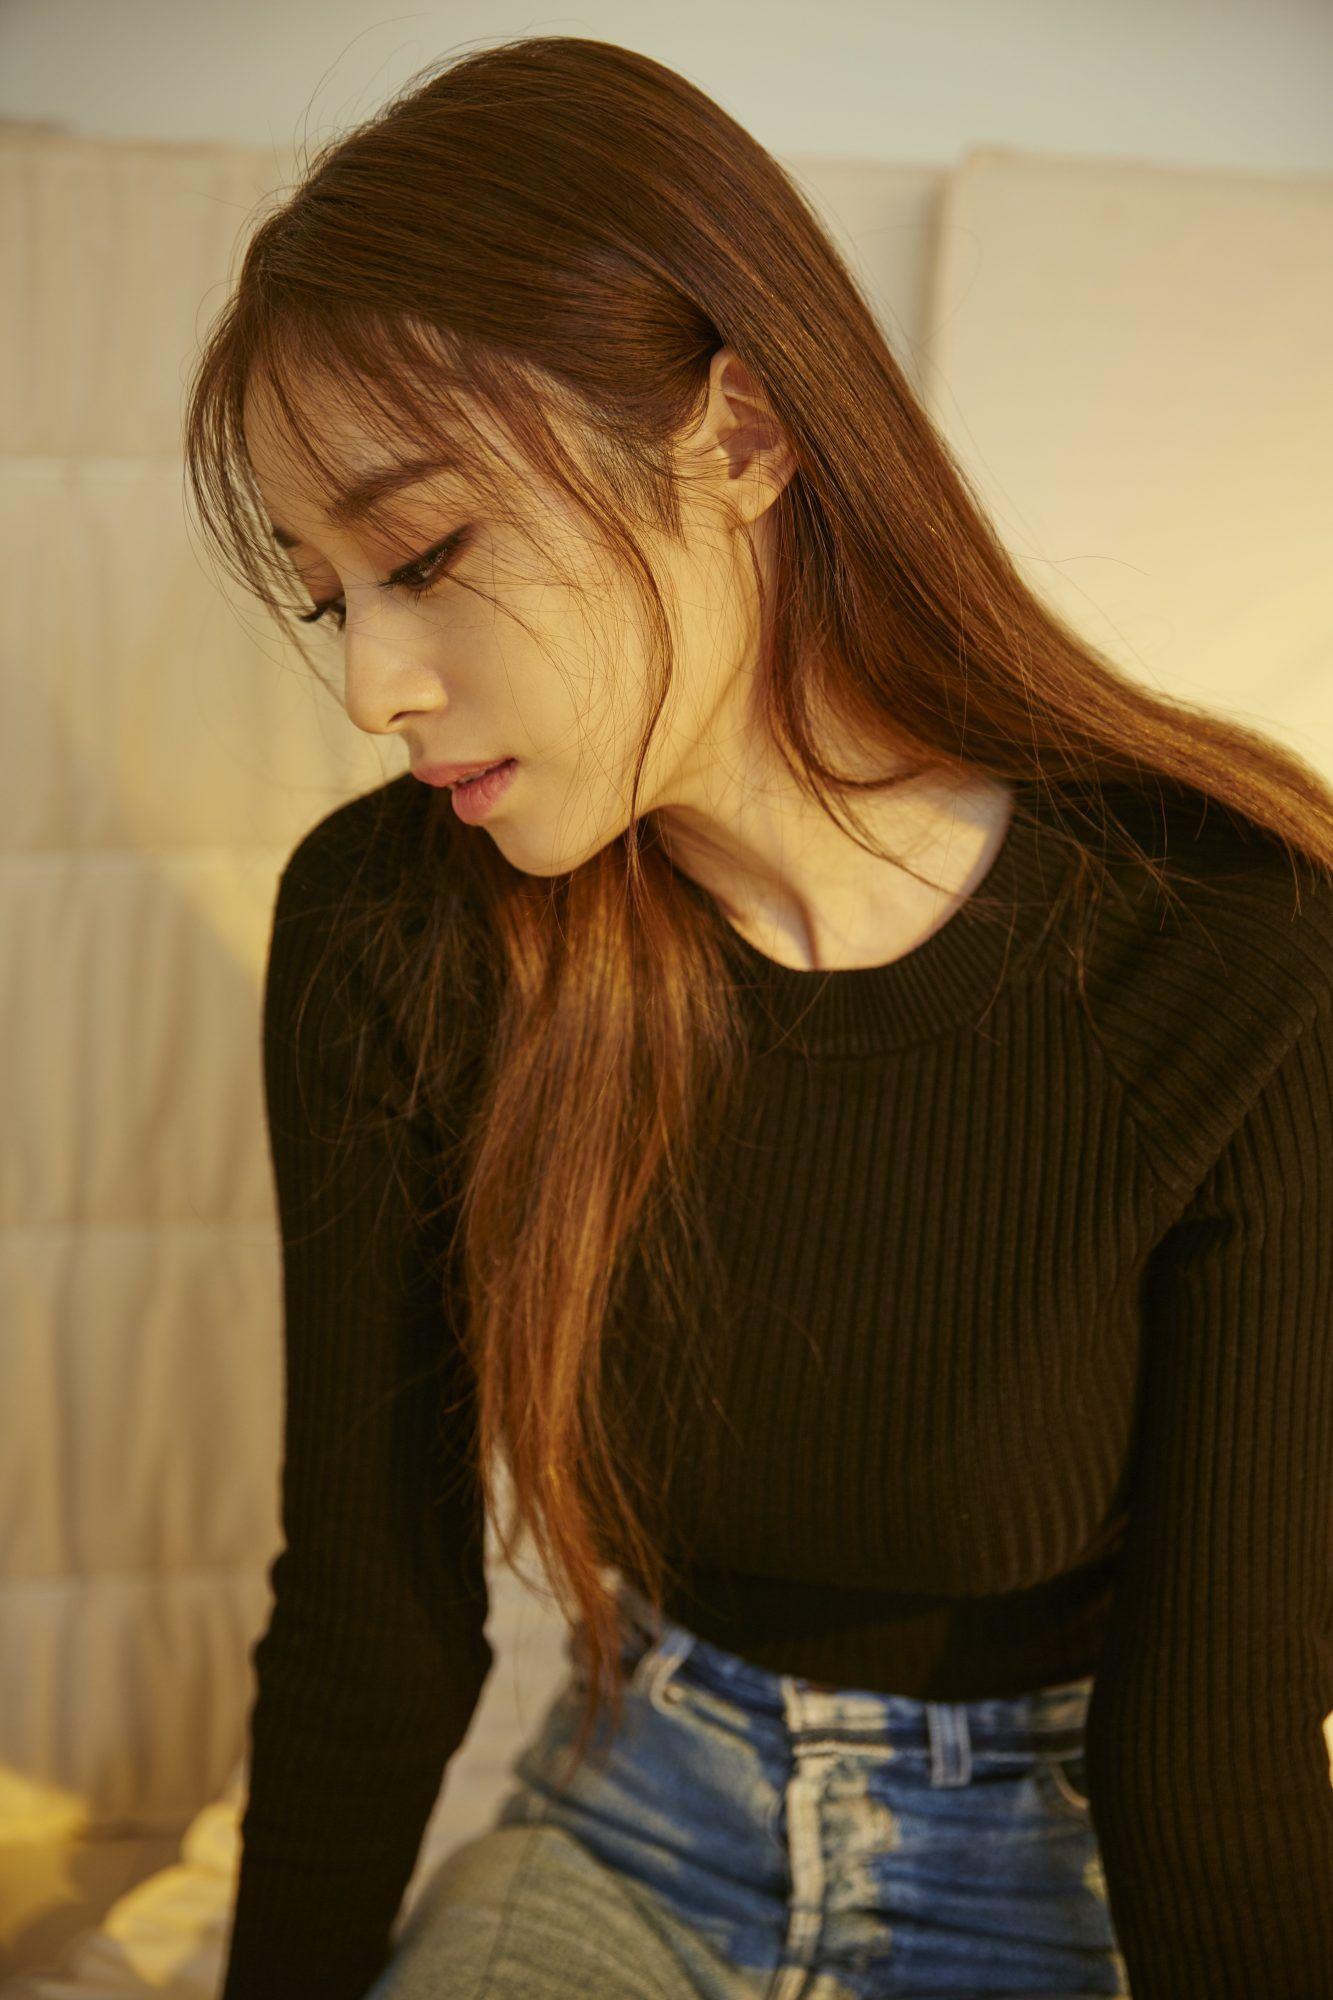 Wallpaper: Wallpaper Hd Jiyeon